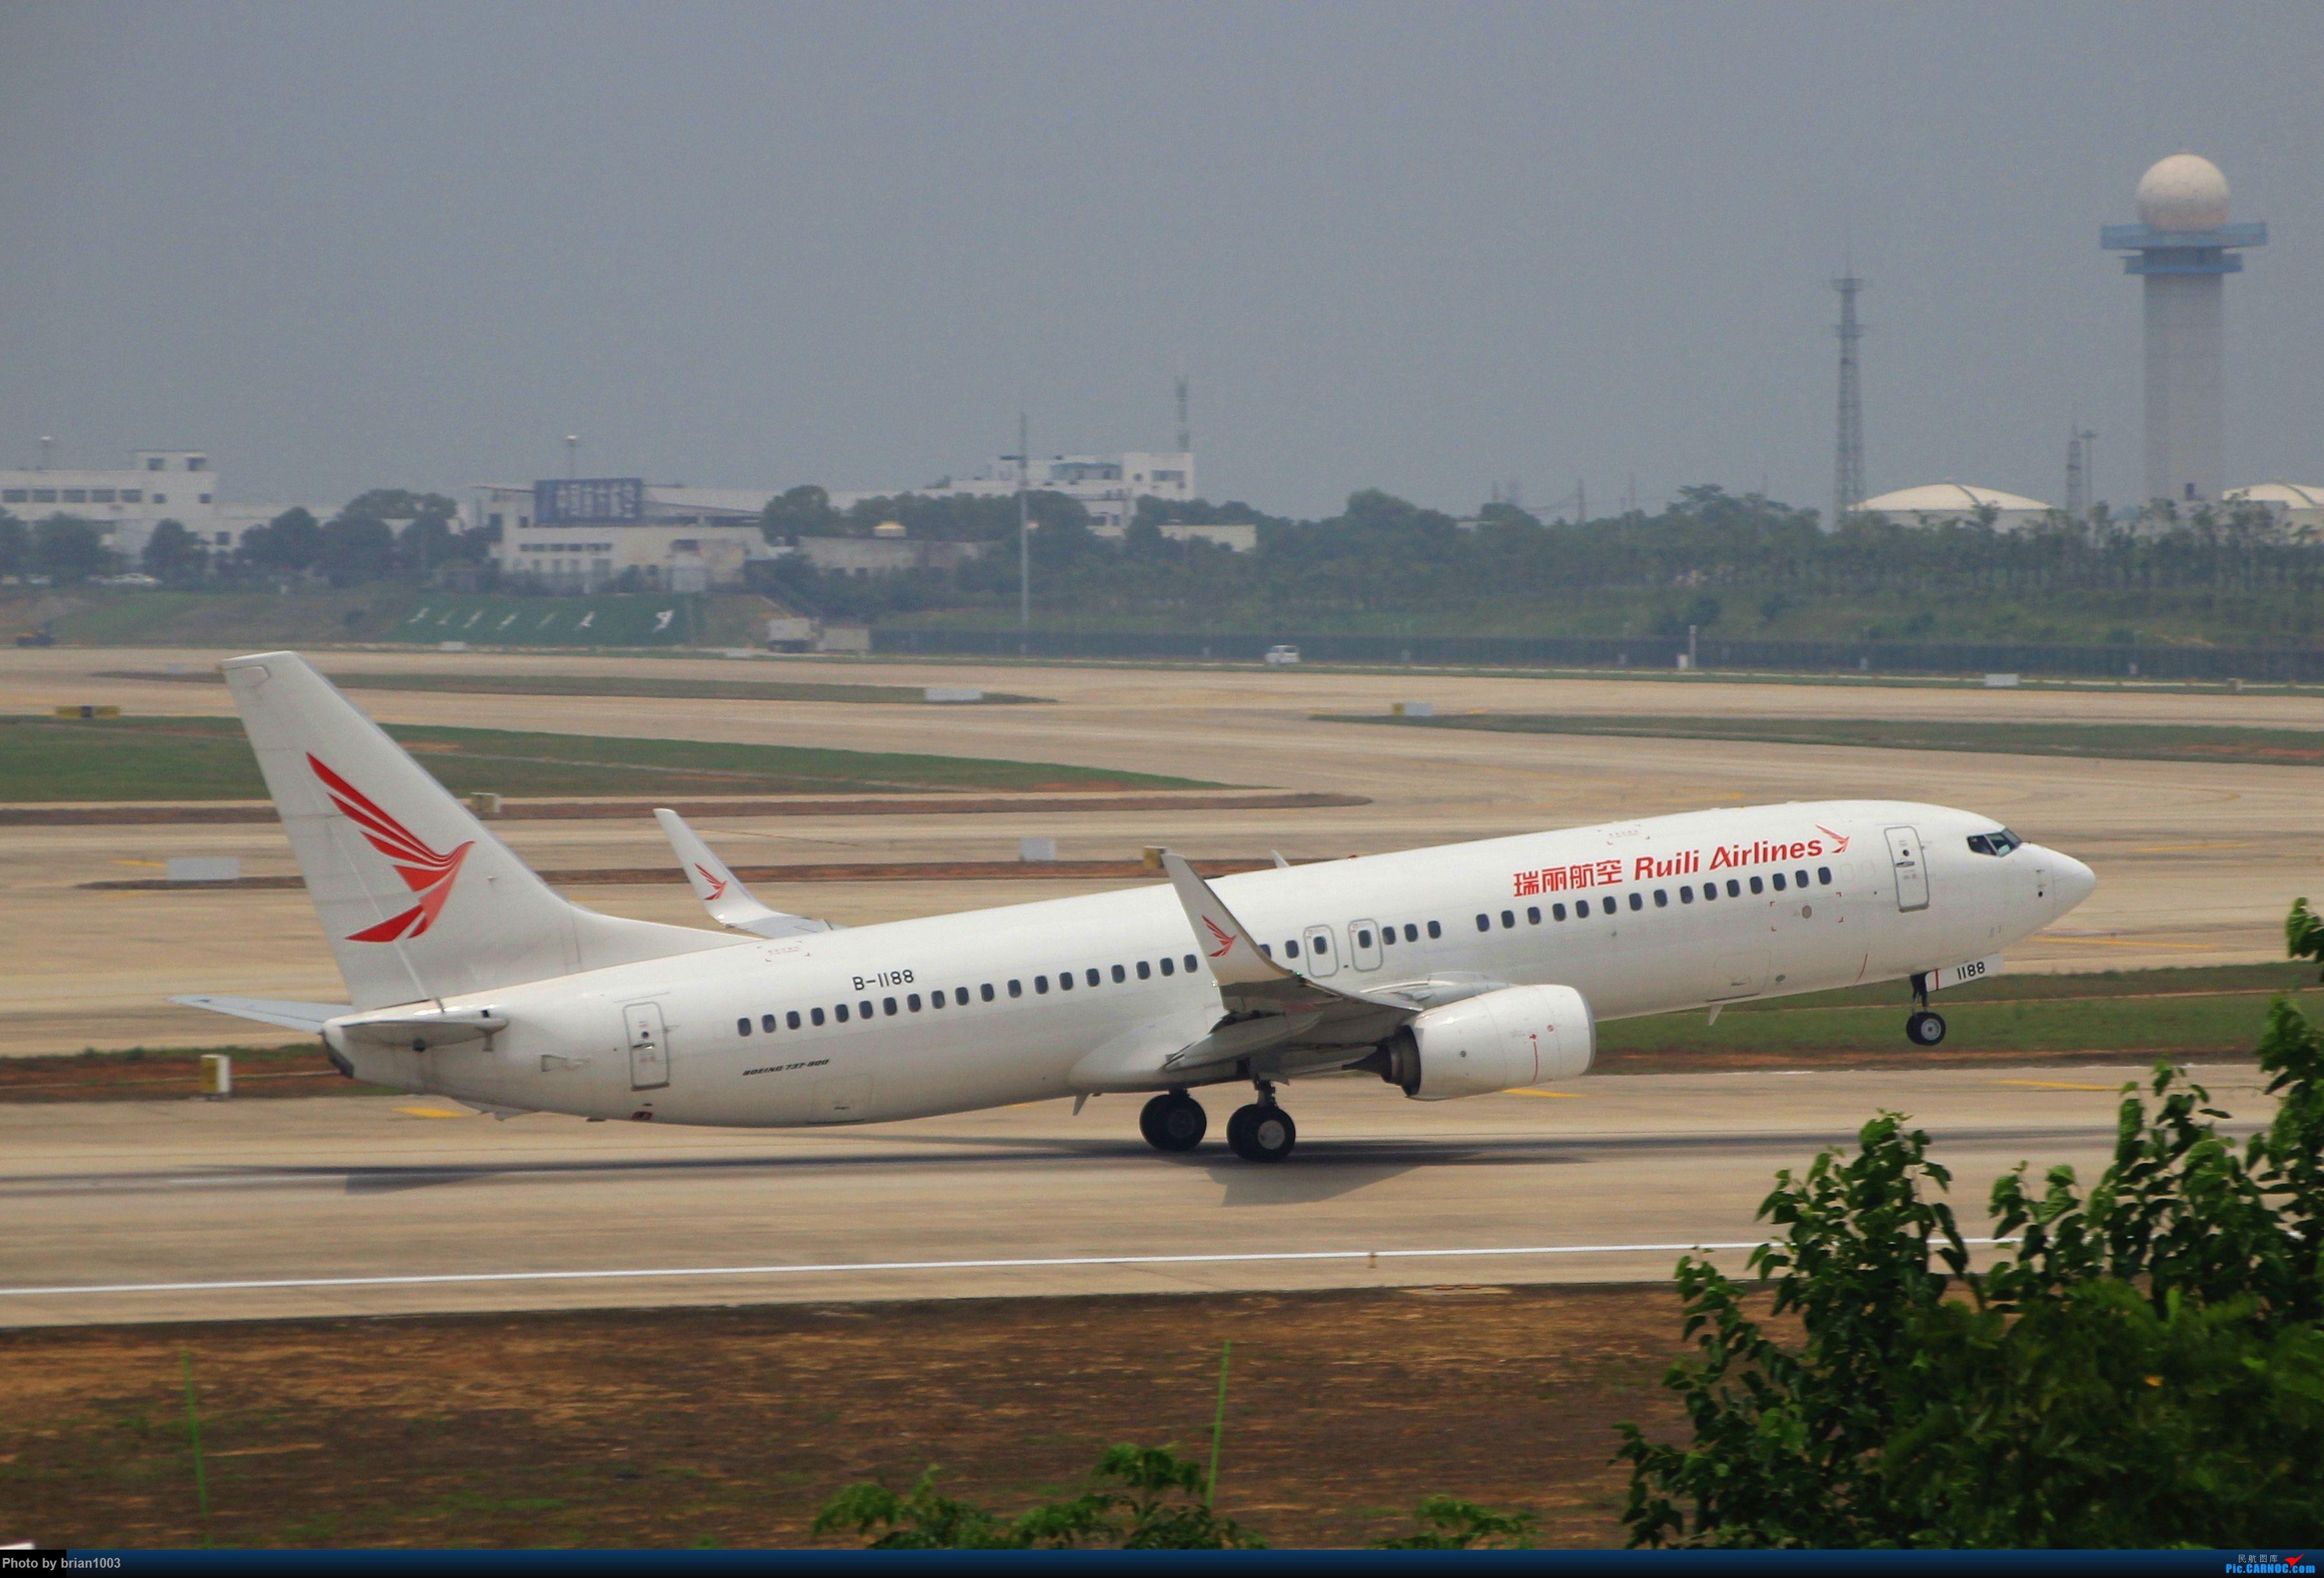 Re:[原创]WUH武汉天河机场拍机之二跑最后忙碌时 BOEING 737-800 B-1188 中国武汉天河国际机场